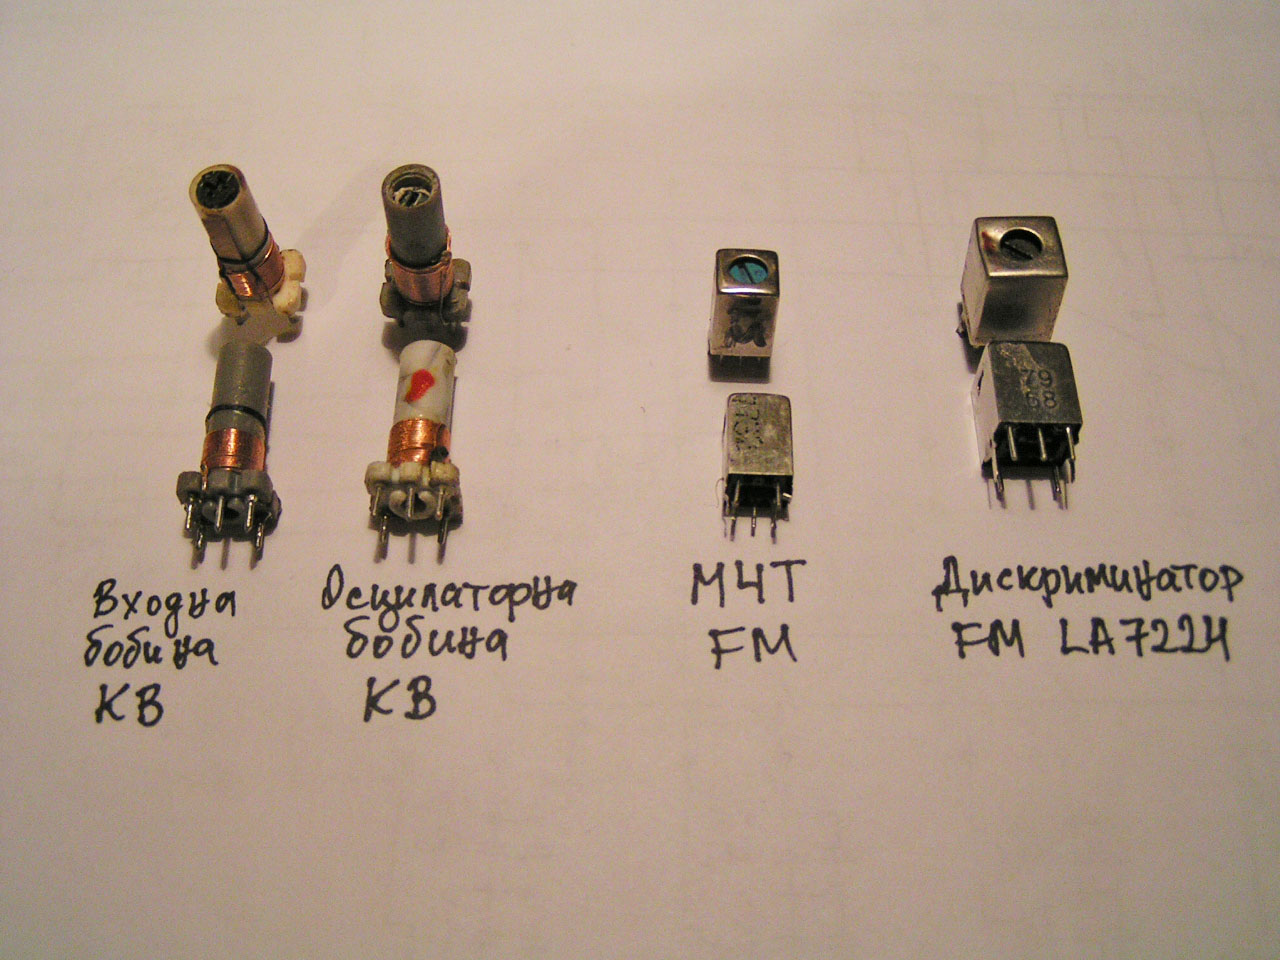 радио приемник сокол 308 схема